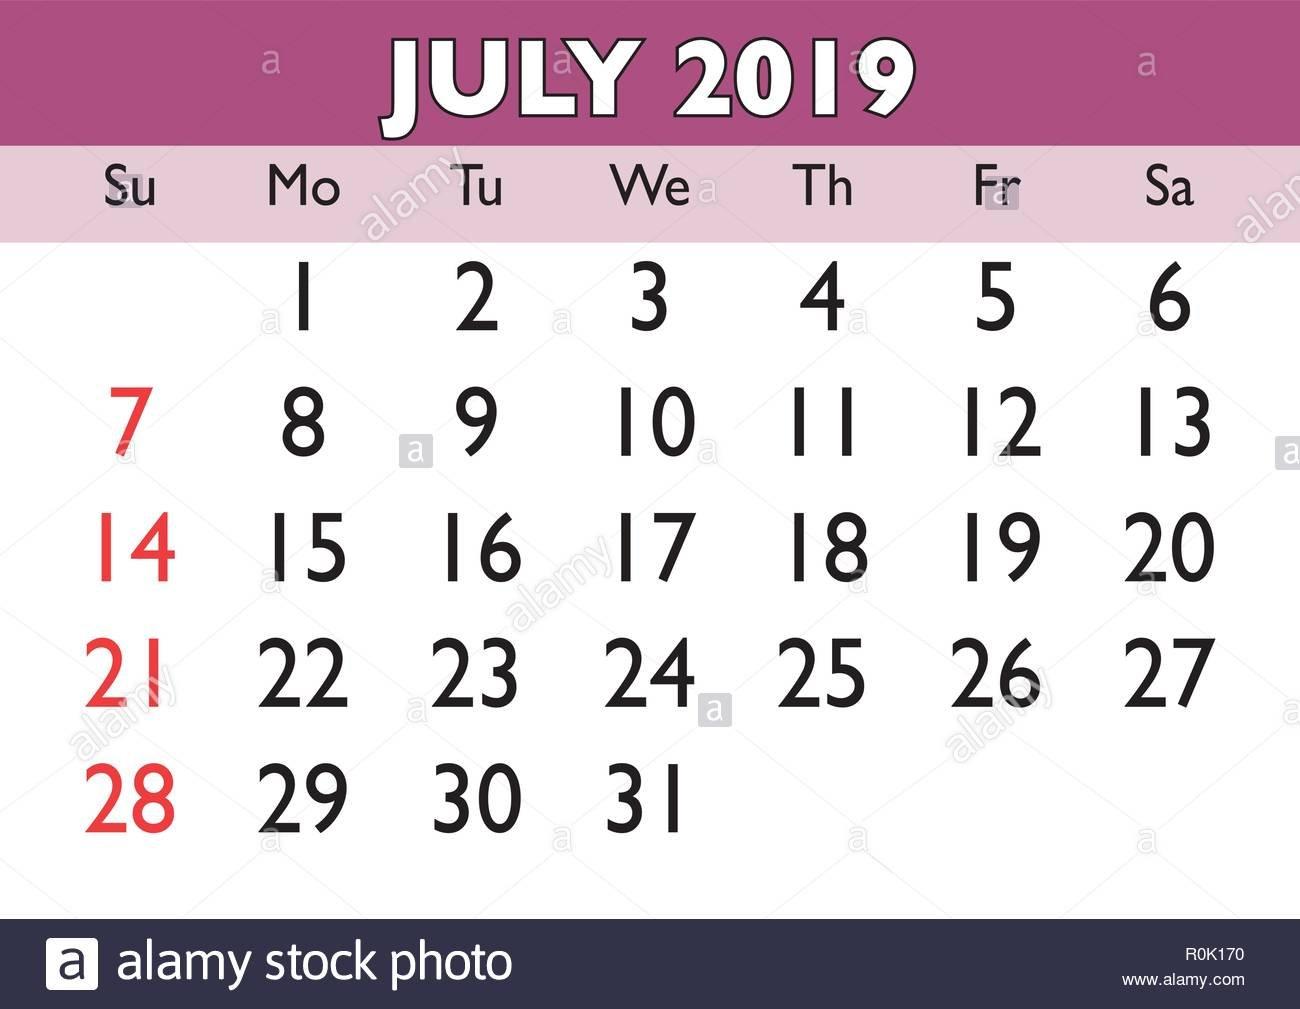 July 2019 Calendar Stock Photos & July 2019 Calendar Stock Images July 1 2019 Calendar